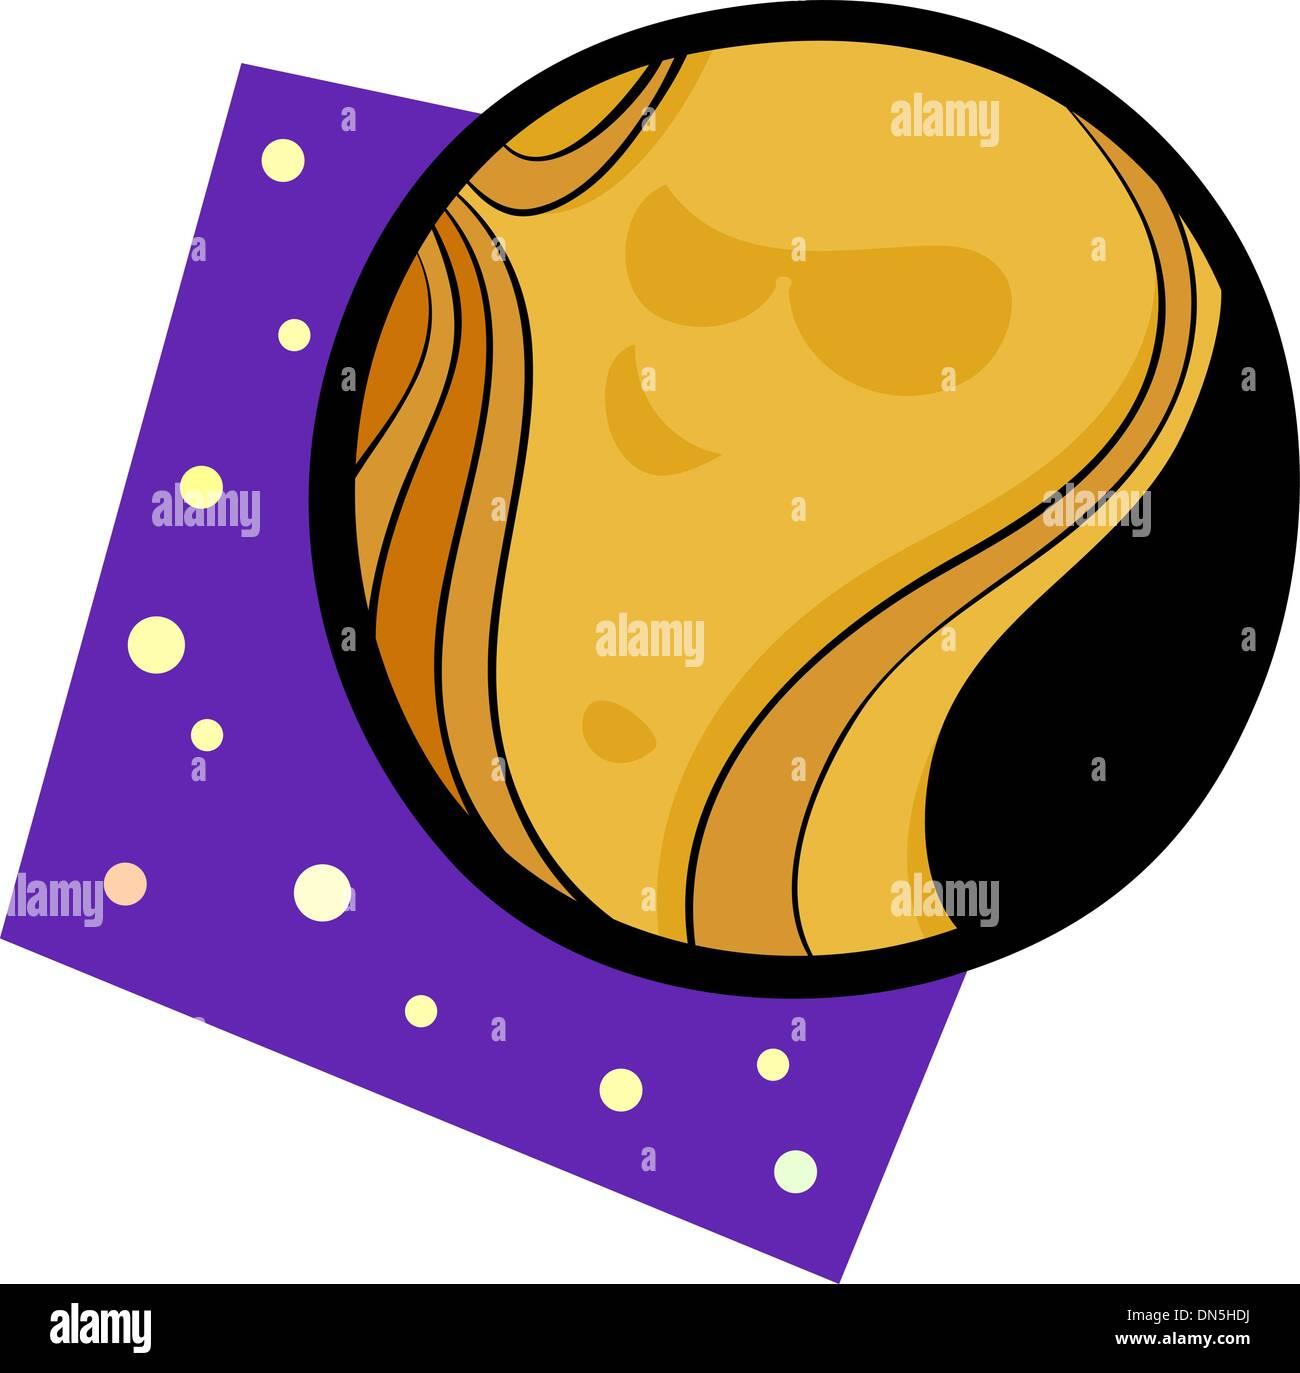 funny venus planet cartoon illustration - Stock Image